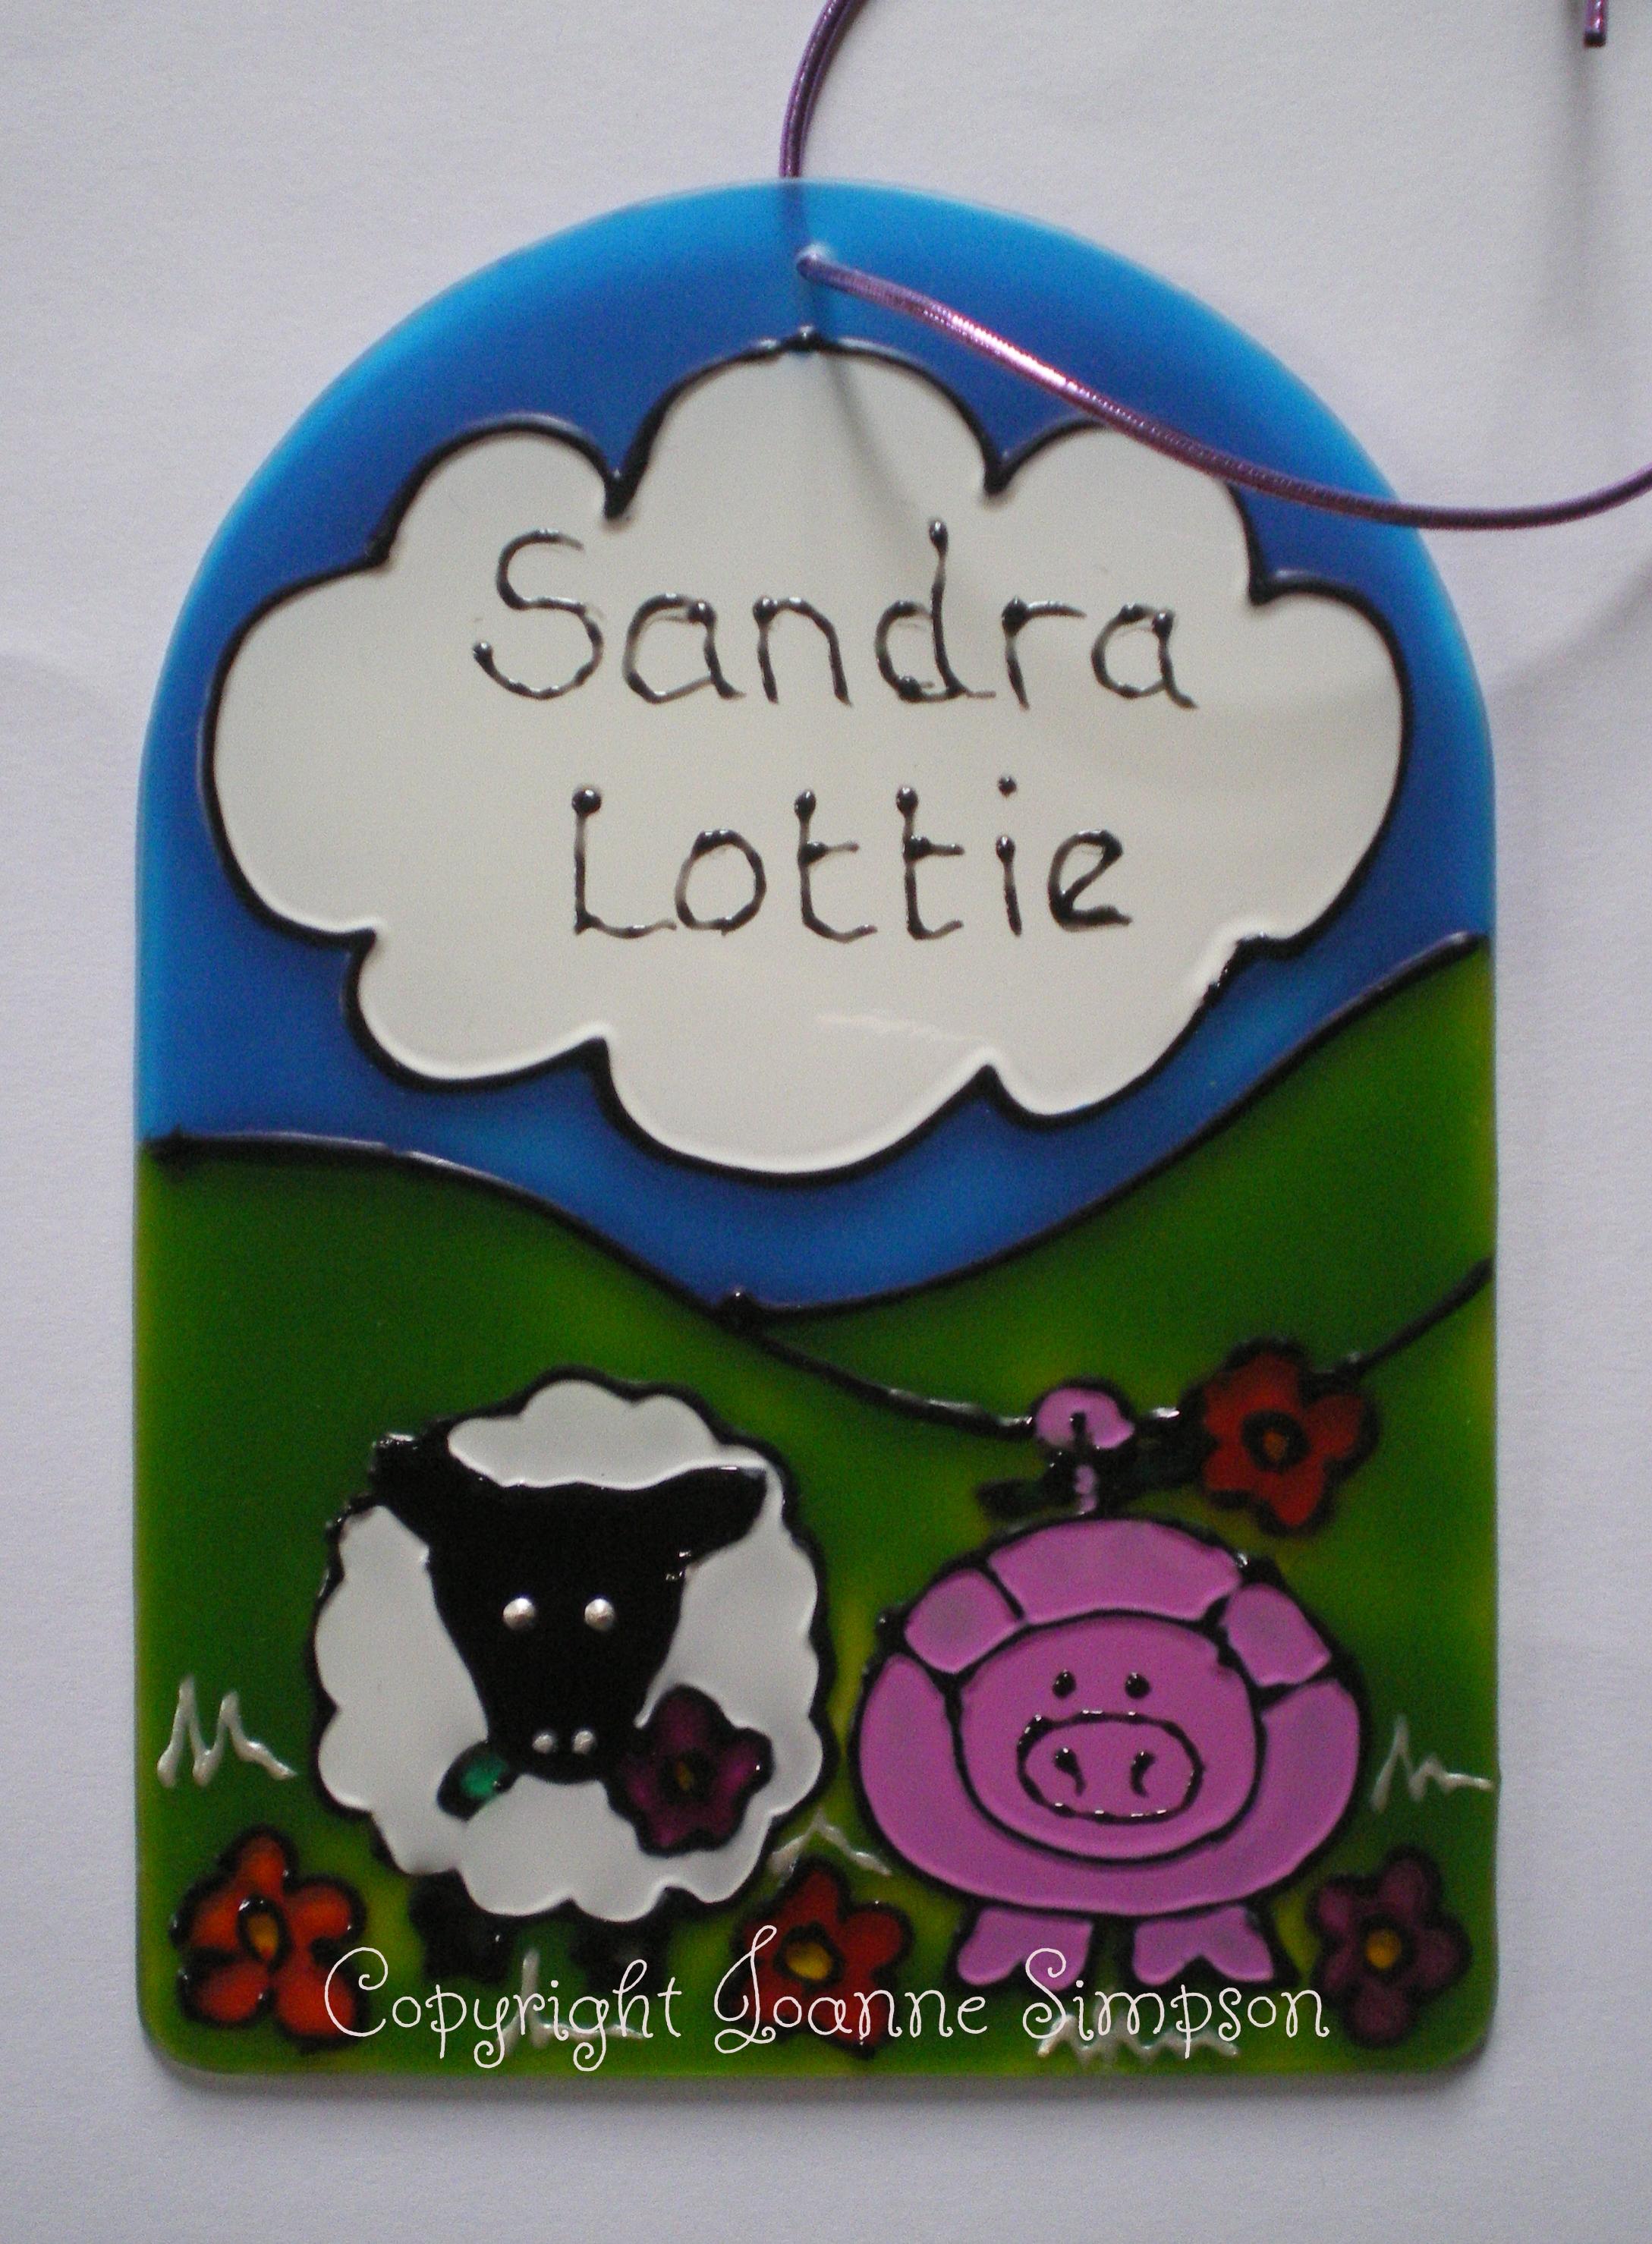 Sandra and Lottie